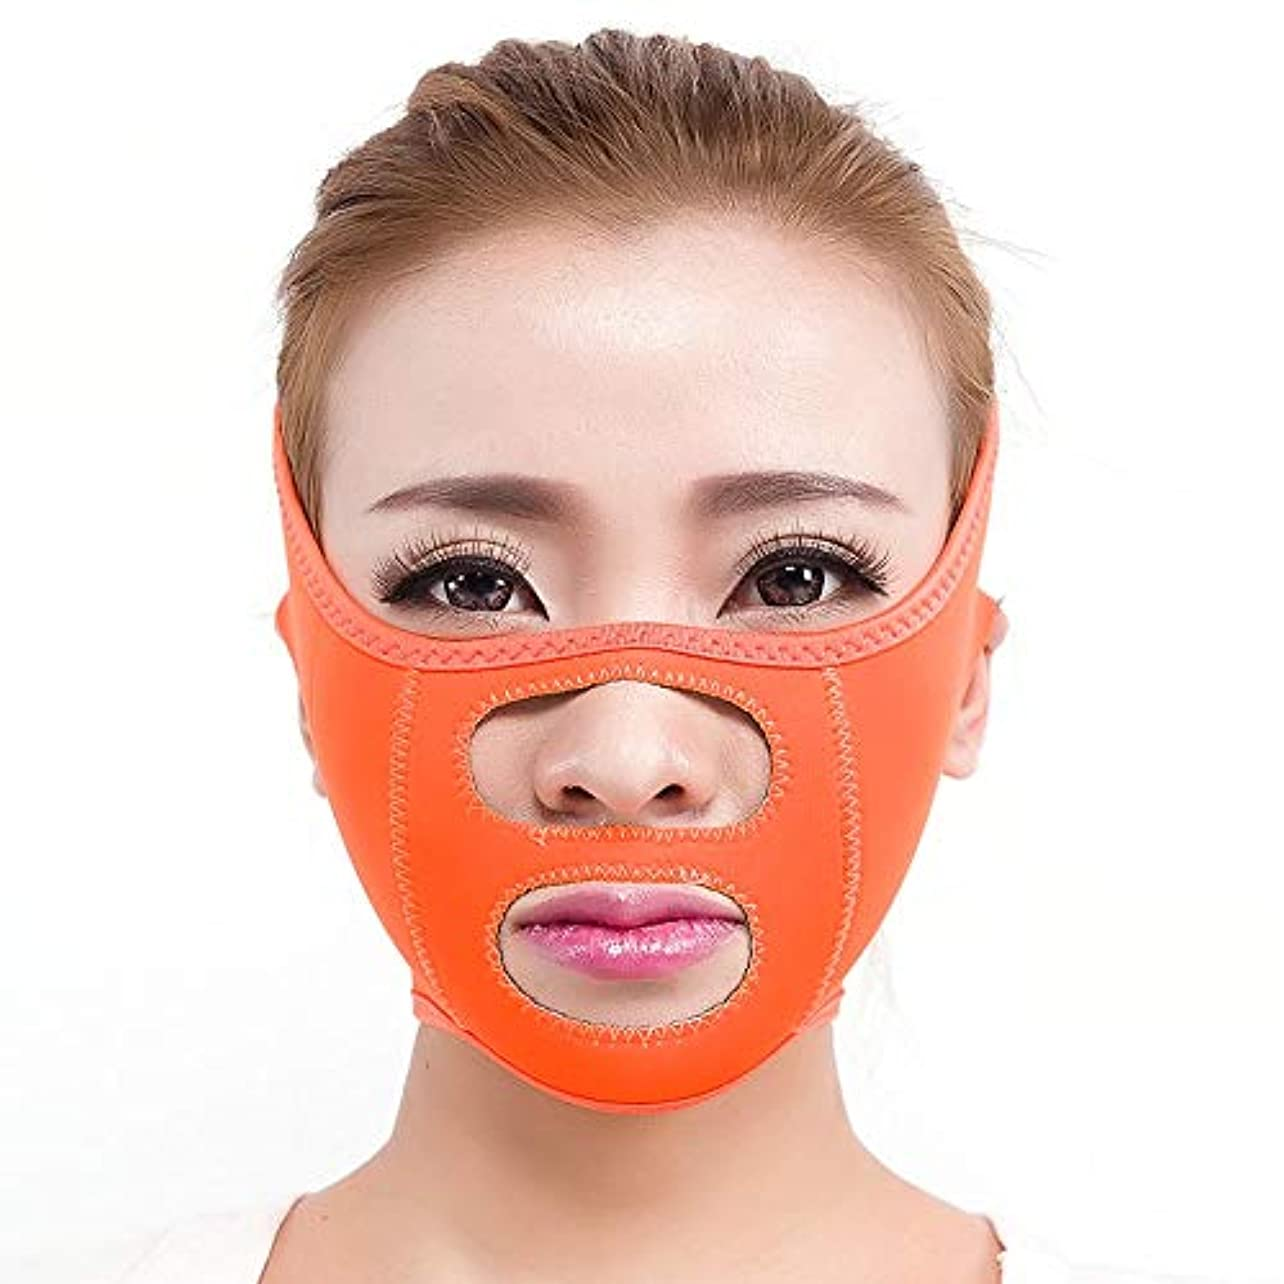 GYZ シンフェイスマスクシンフェイス包帯シンフェイスアーティファクトシンフェイスフェイシャルリフティングシンフェイススモールVフェイススリープシンフェイスベルト Thin Face Belt (Color : A)